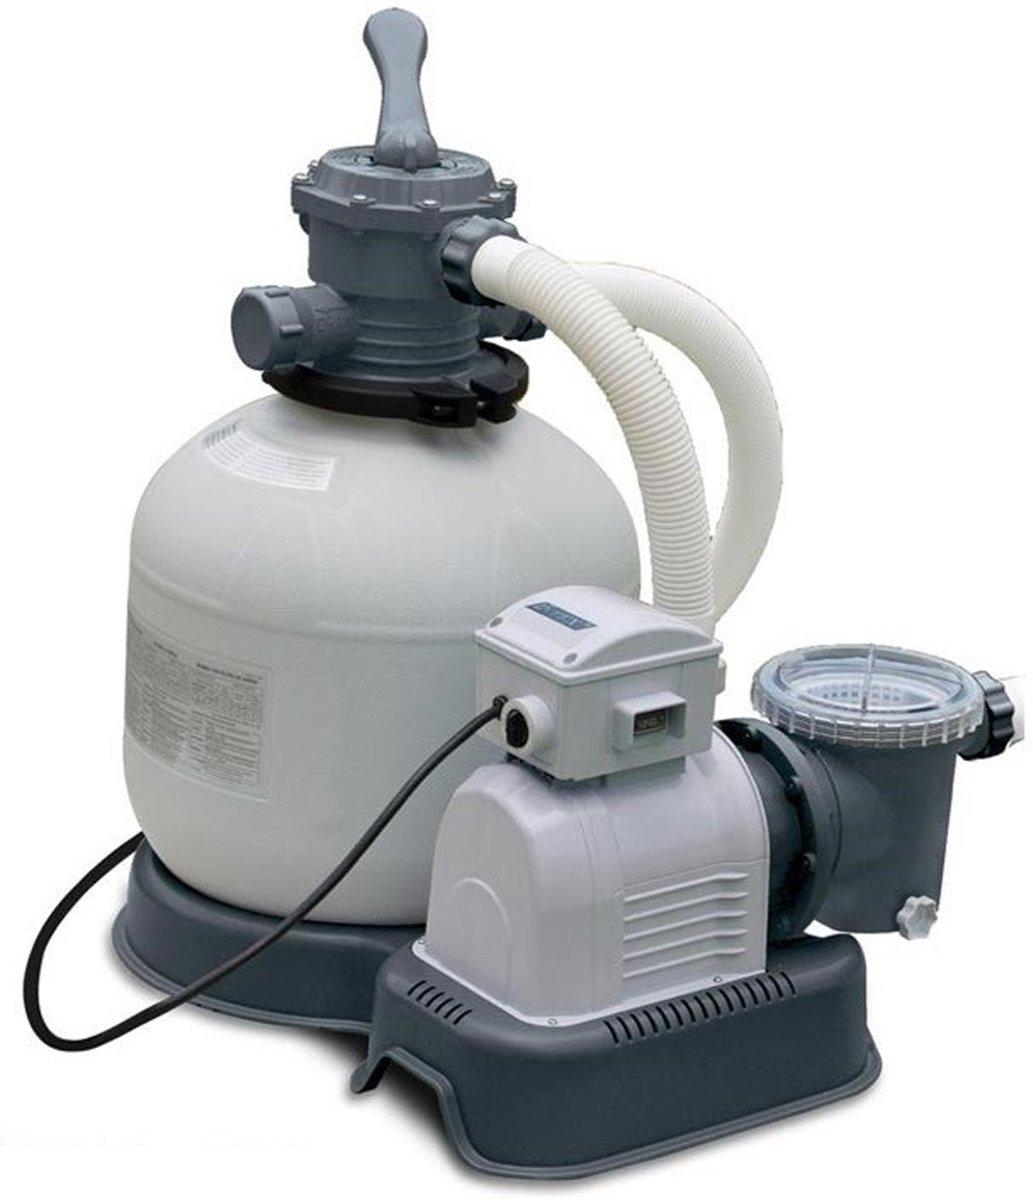 Intex zandfilterpomp 10 m3/uur voor grote Intex baden